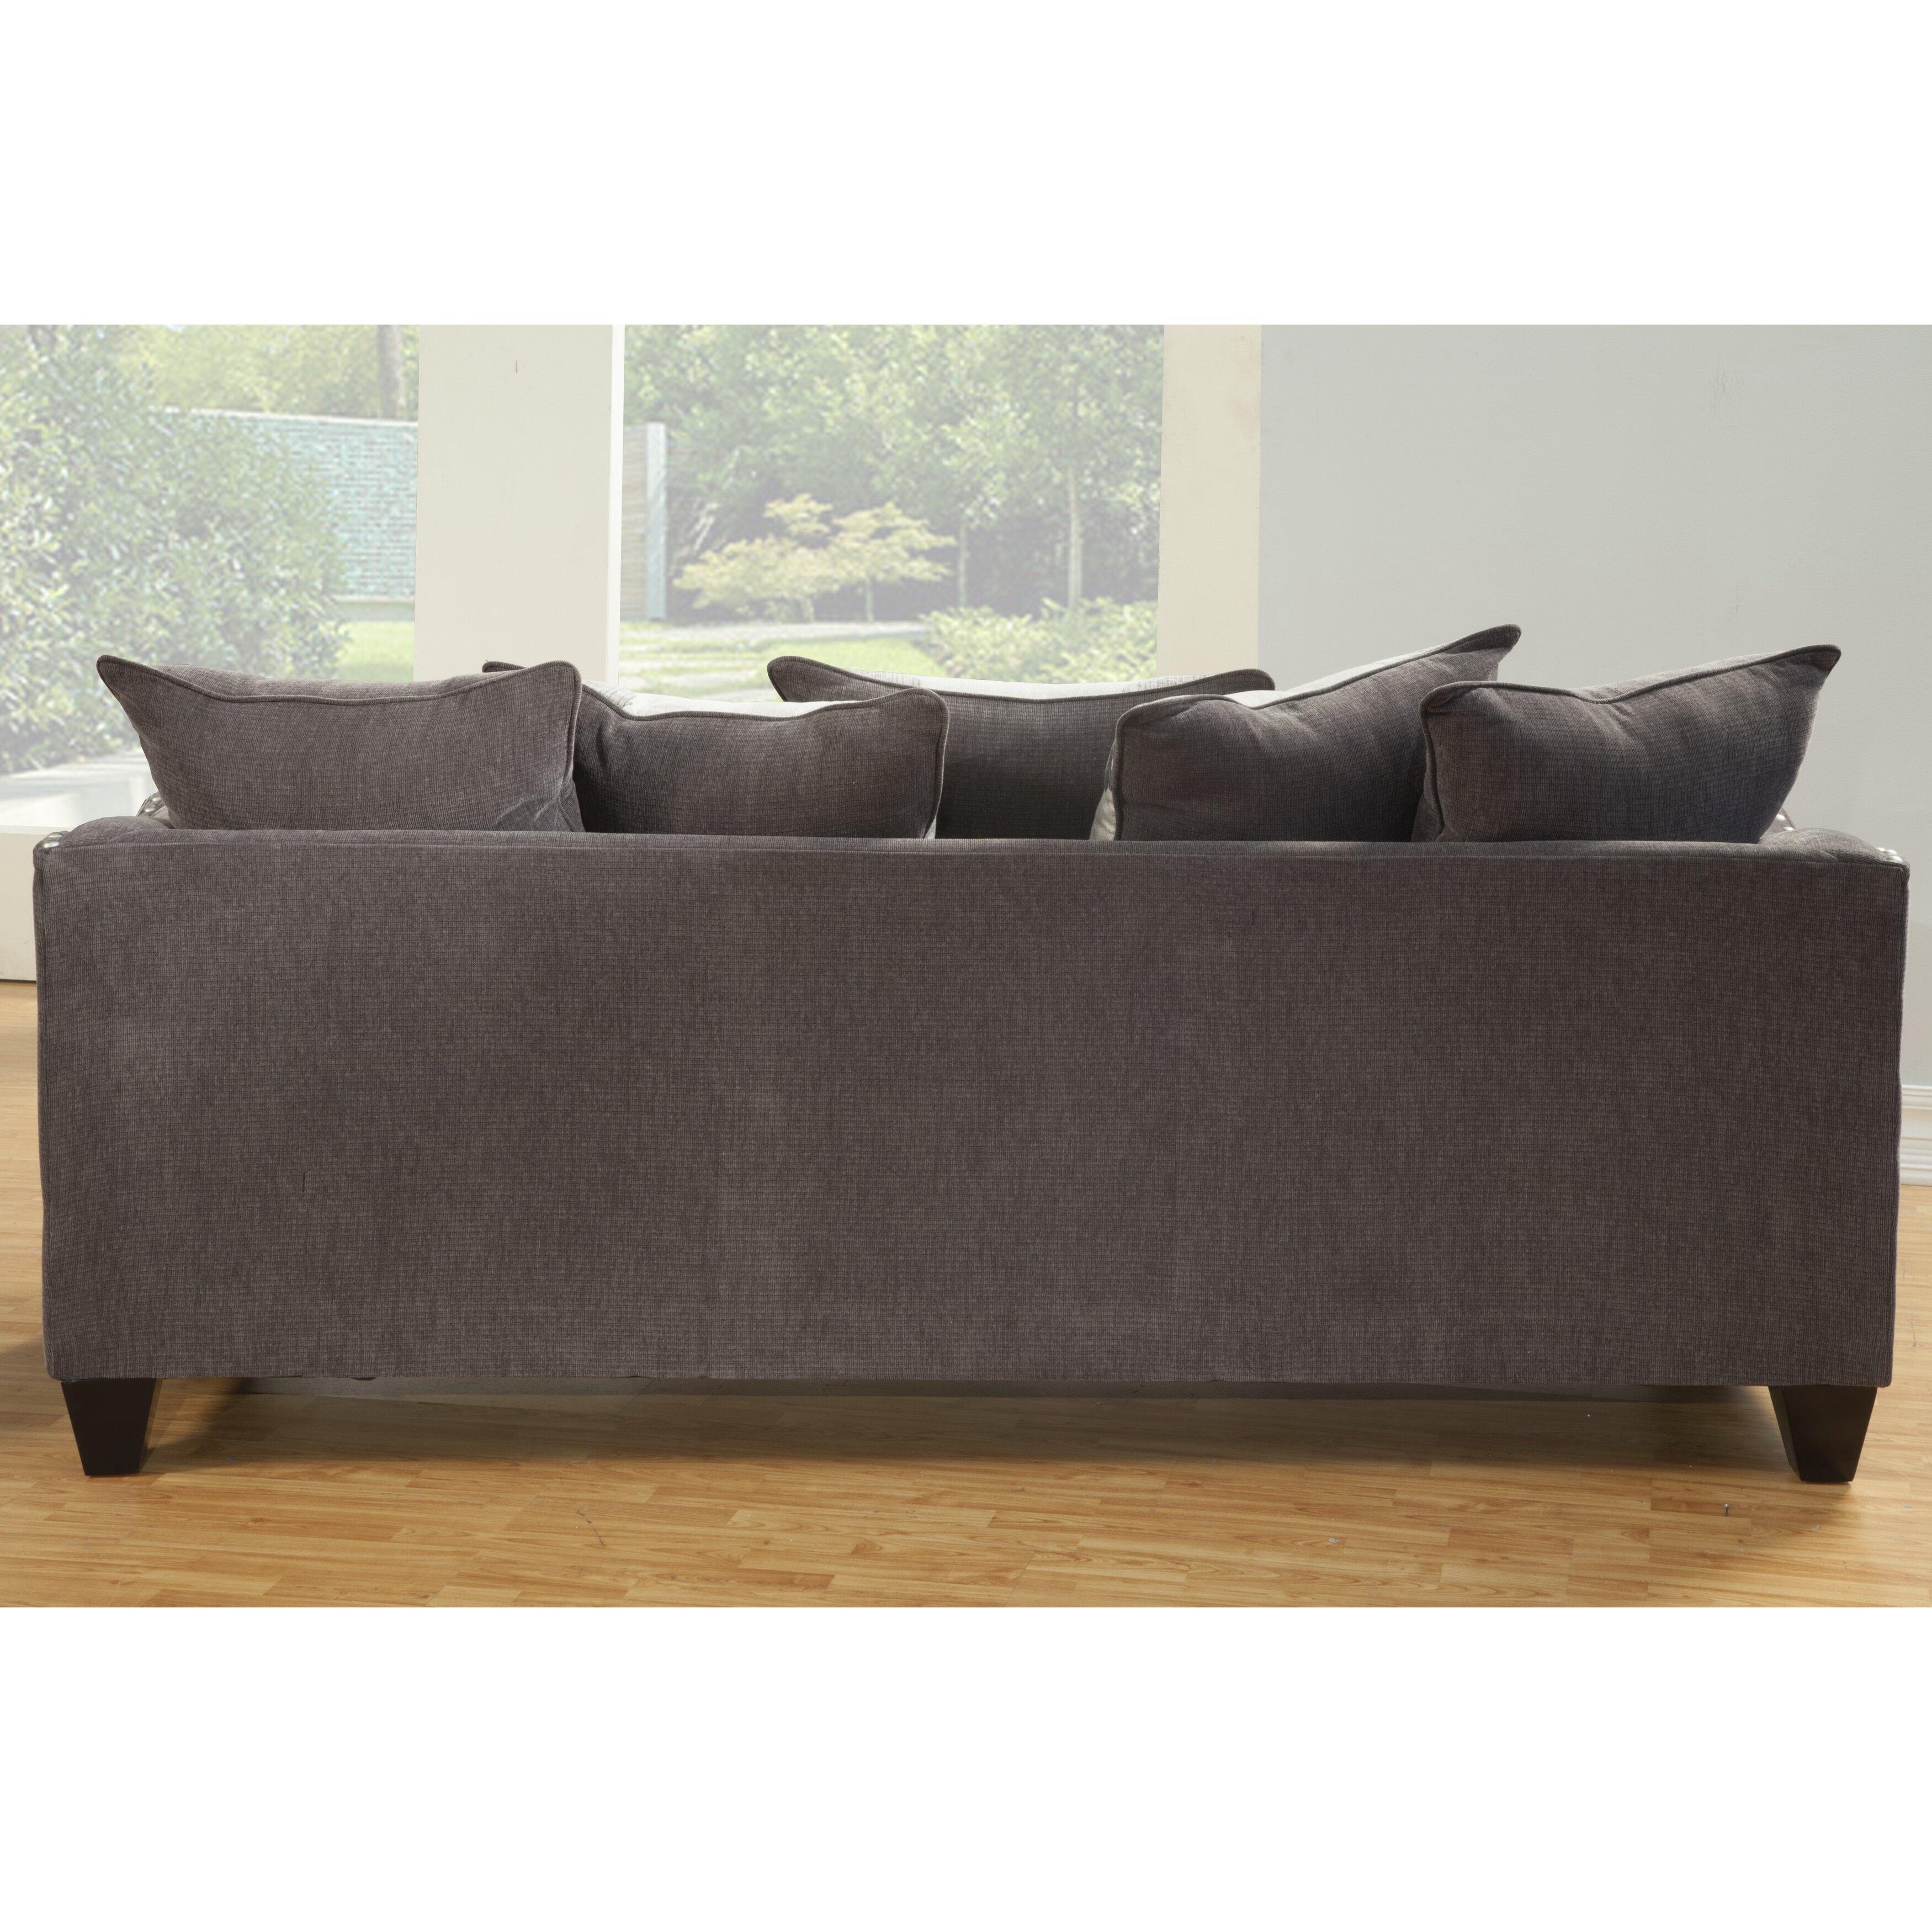 Hokku designs salem sofa reviews wayfair for Hokku designs living room furniture